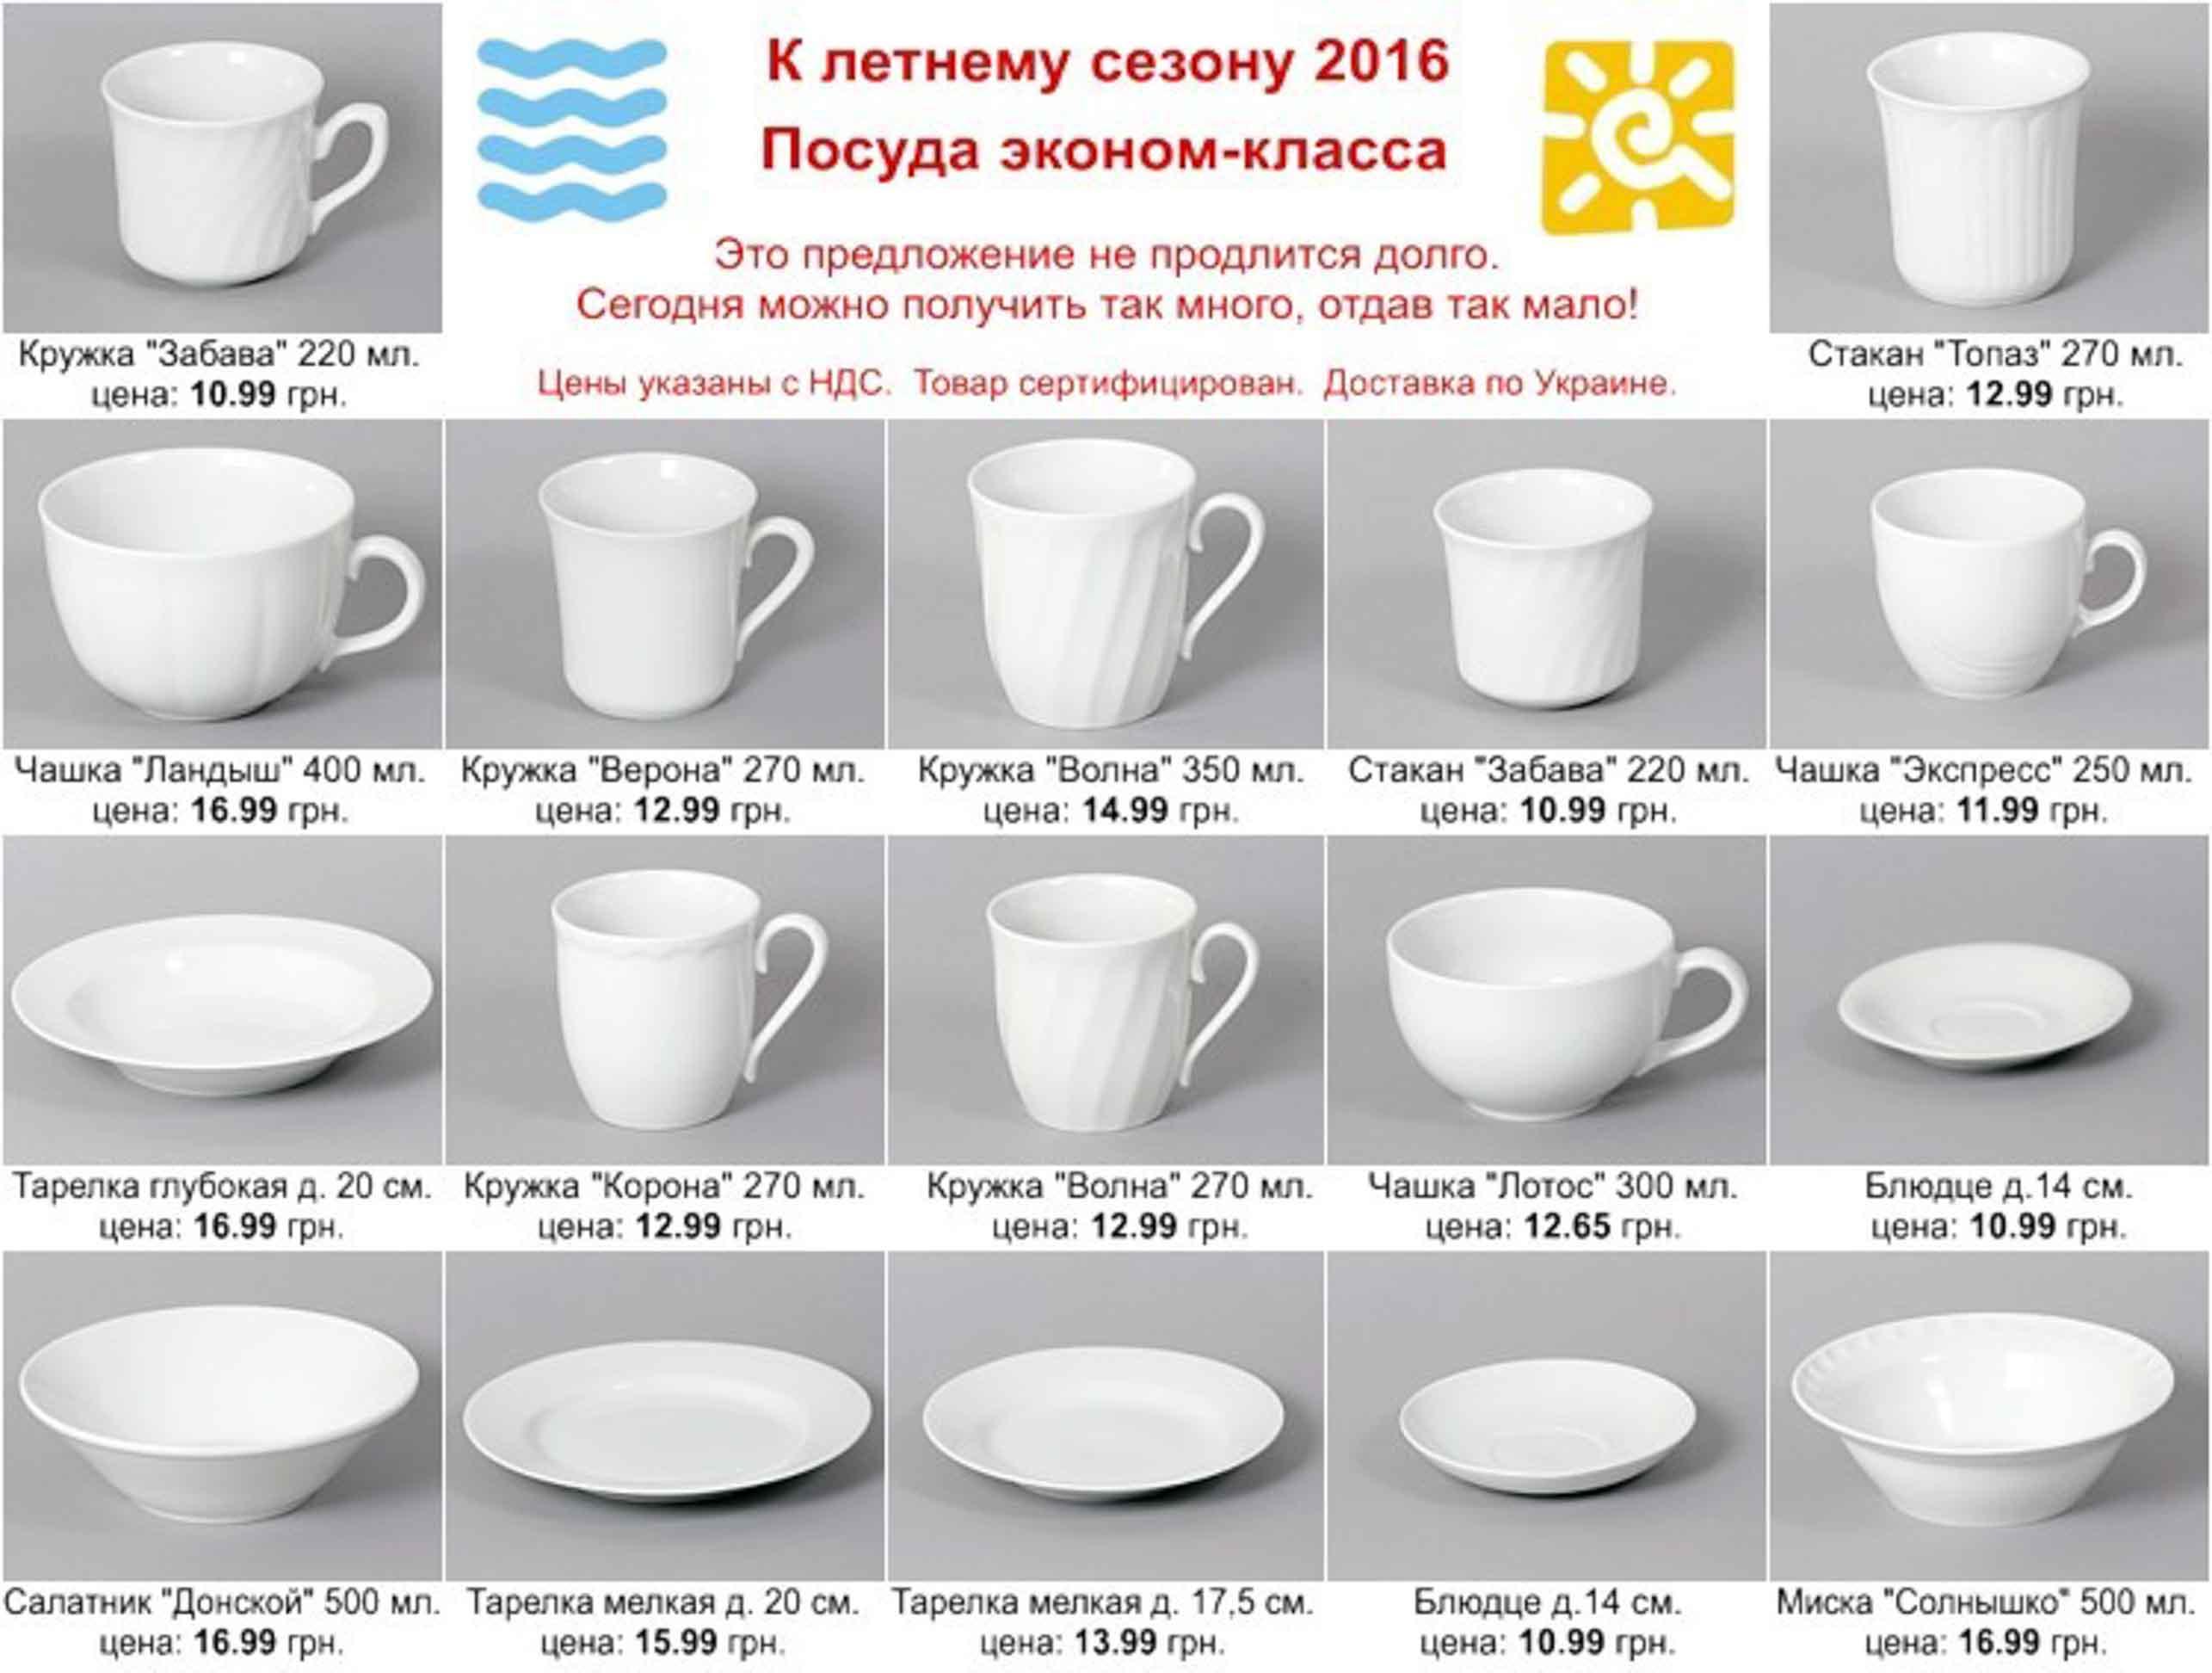 Посуда эконом-класса к летнему сезону 2016. фото 1